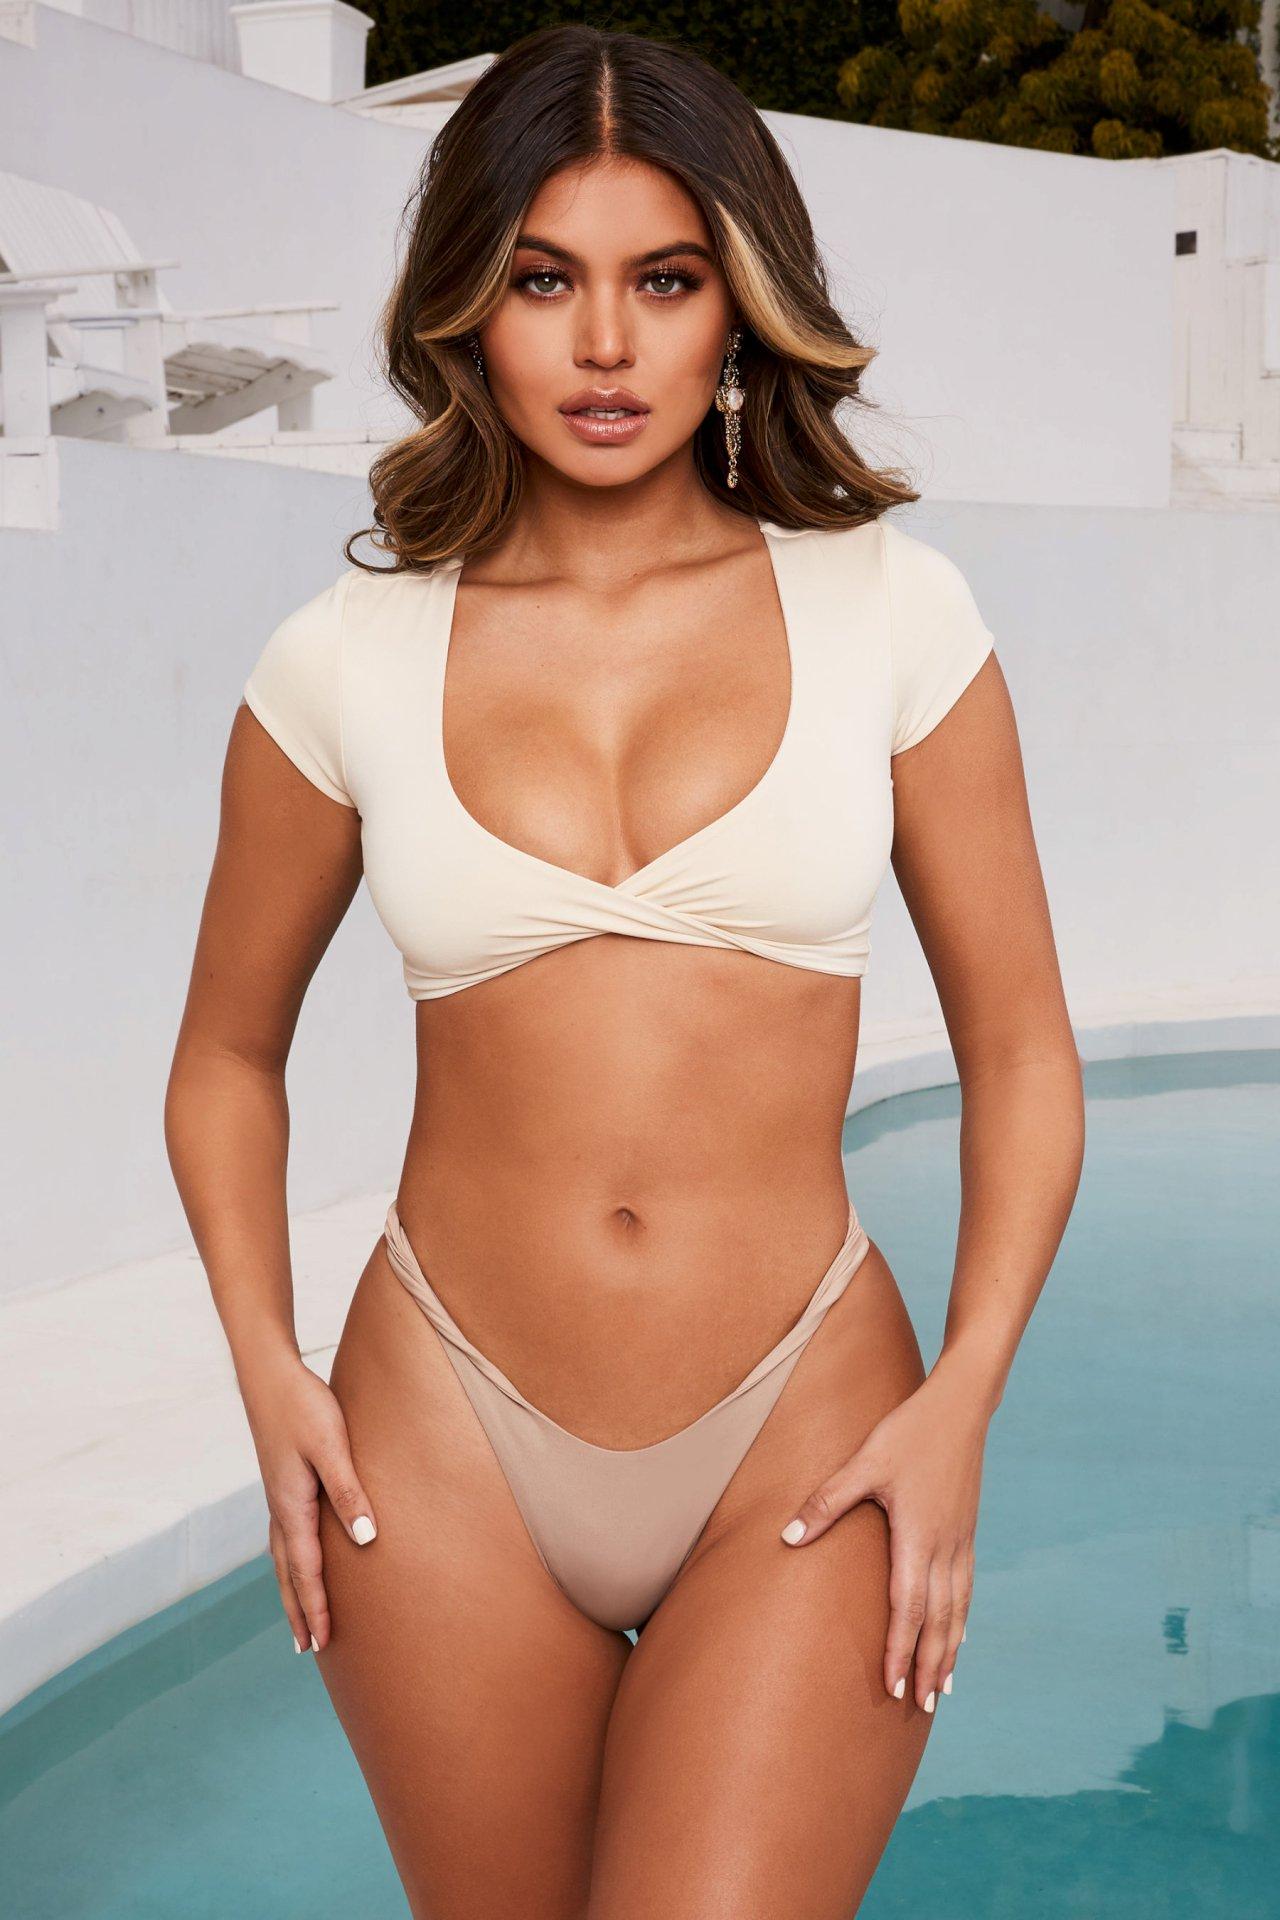 Sofia Jamora Hot Body